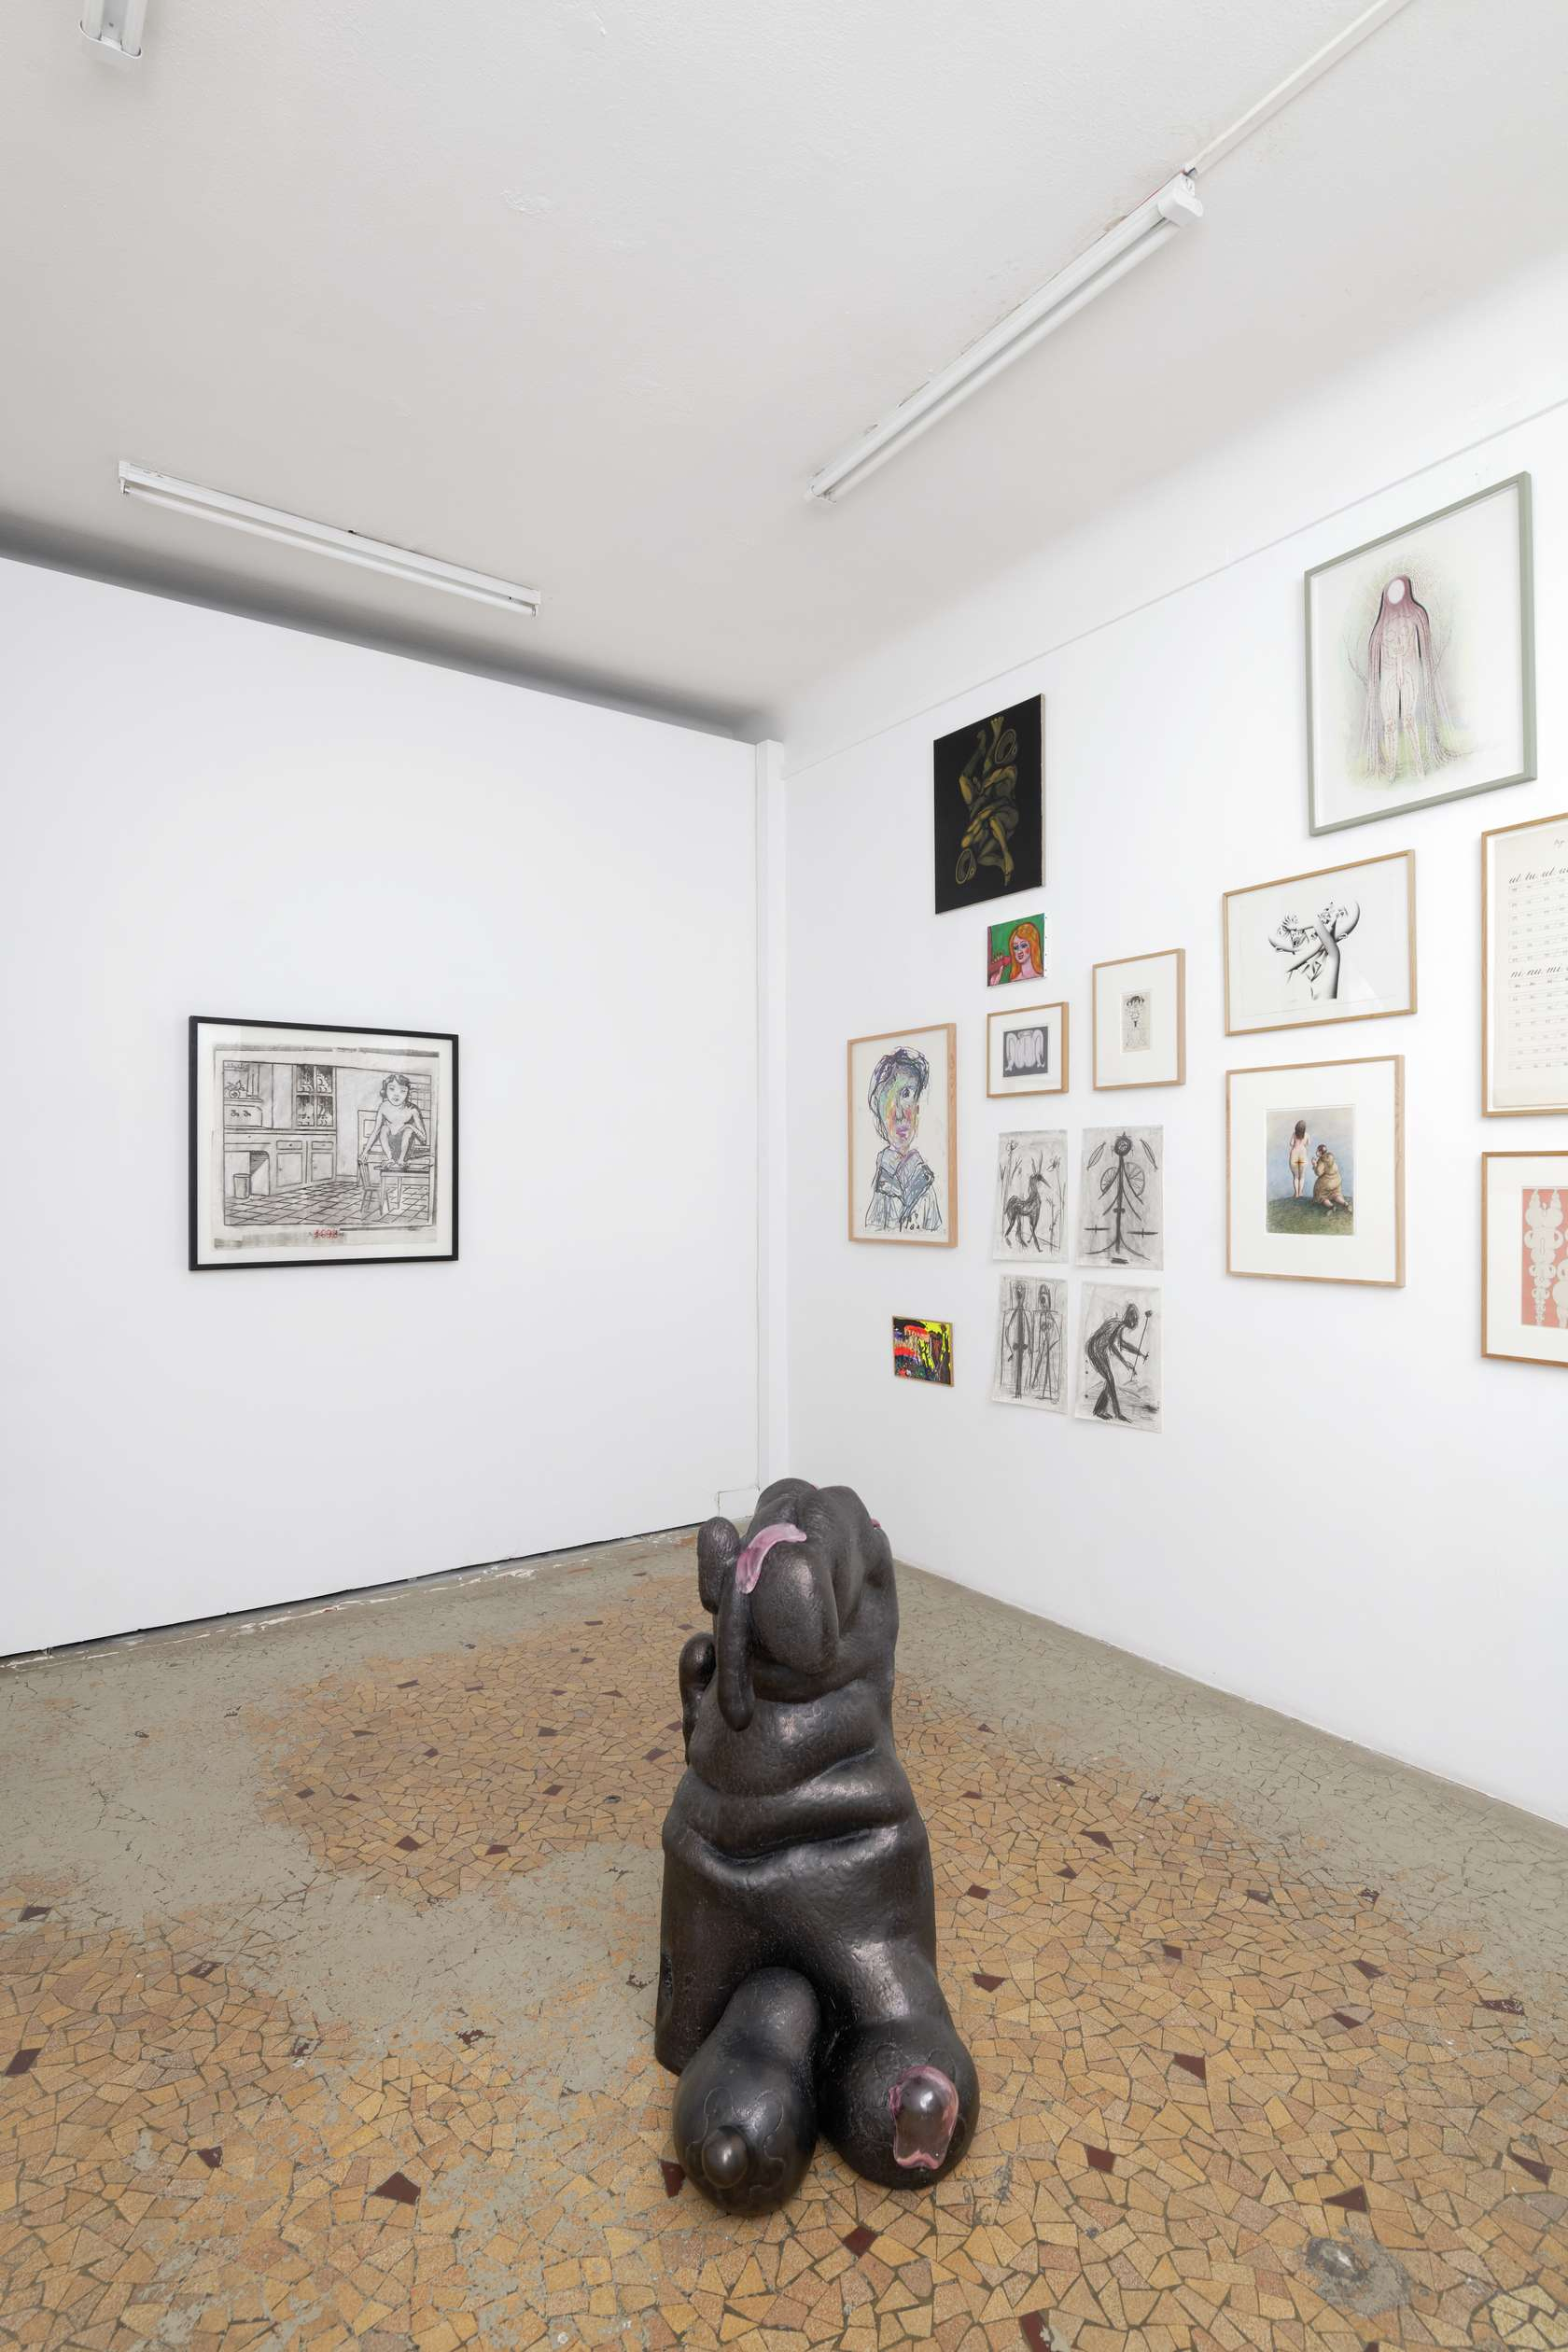 Topor n'est pas mort, Galerie Anne Barrault, Paris (FR) September 25 - October 27, 2019 © A. Mole